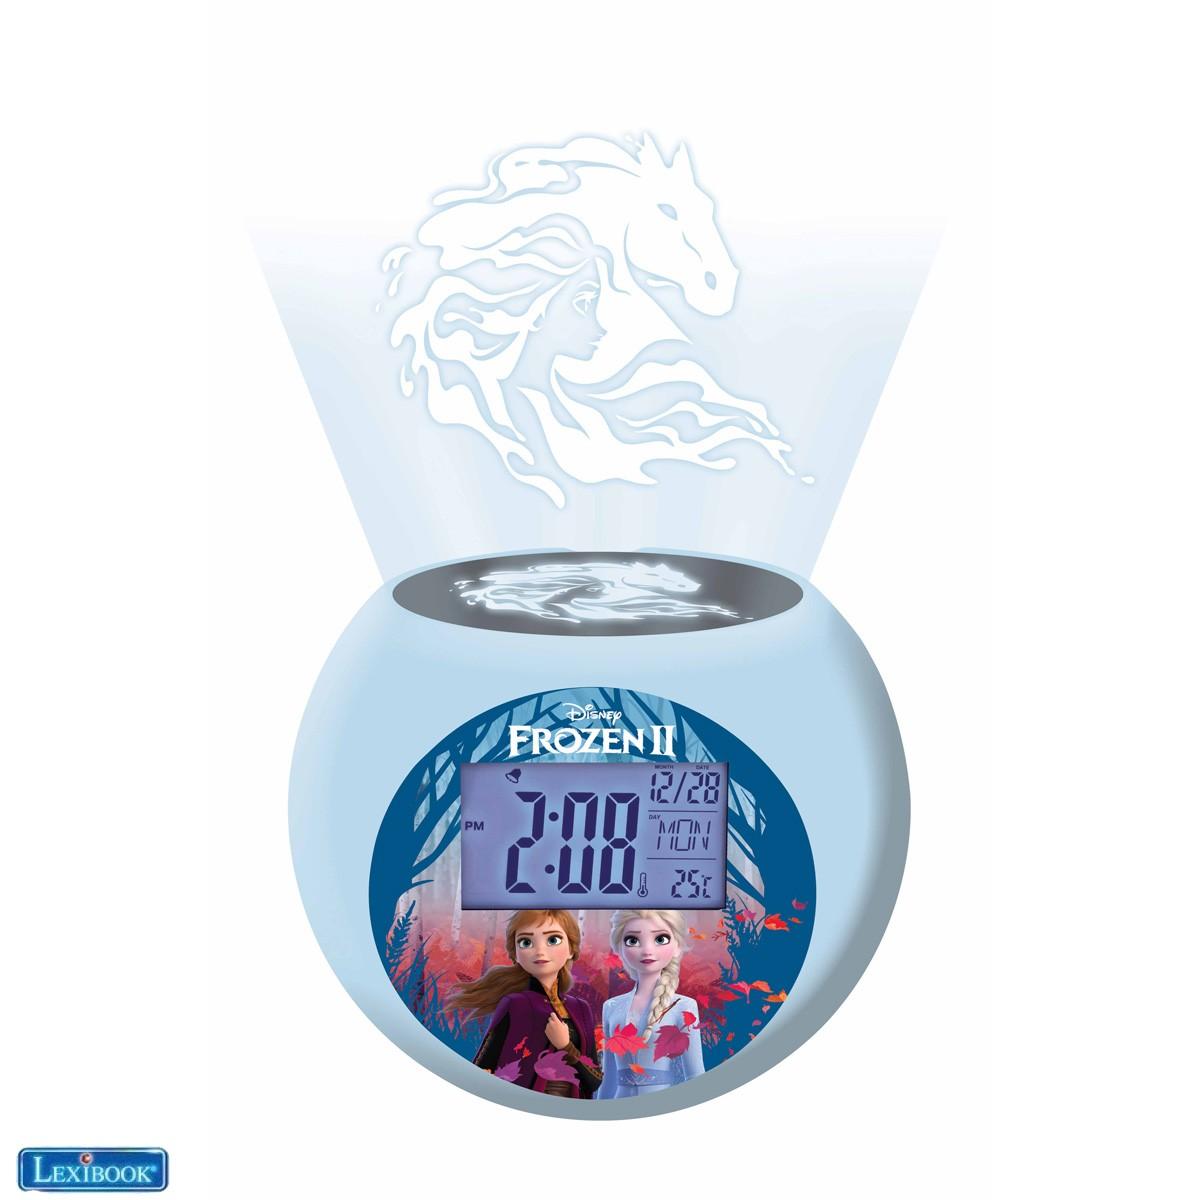 Frozen 2 Radio projector clock